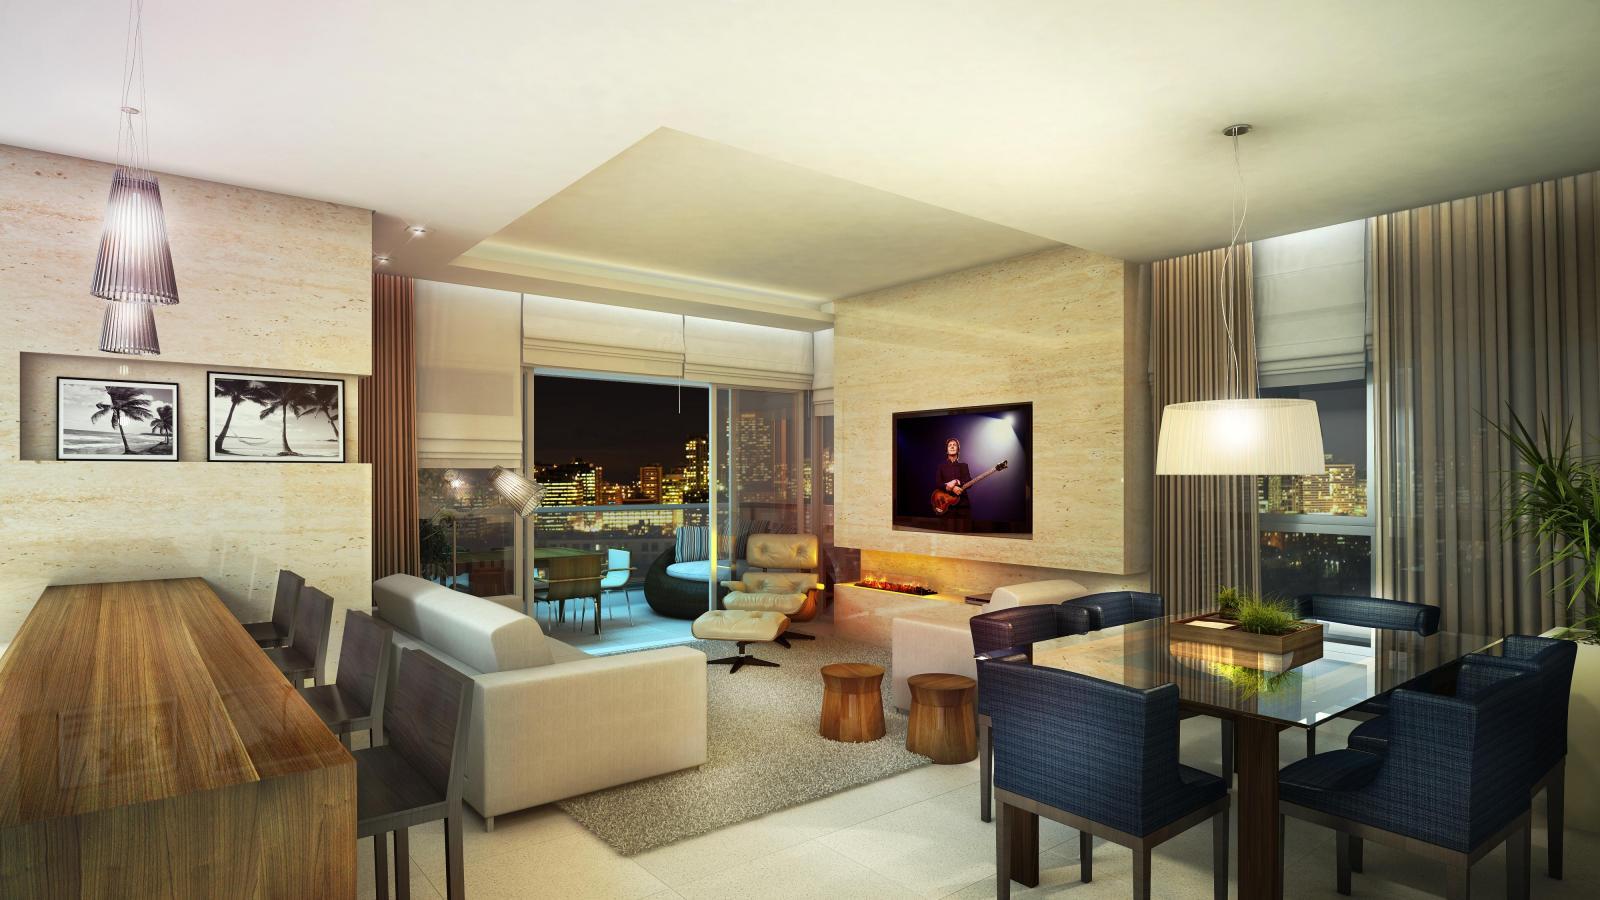 Fotos De Sala De Estar Apartamento ~ apartamento sala de estar 3 dorms hall de entrada hall de entrada